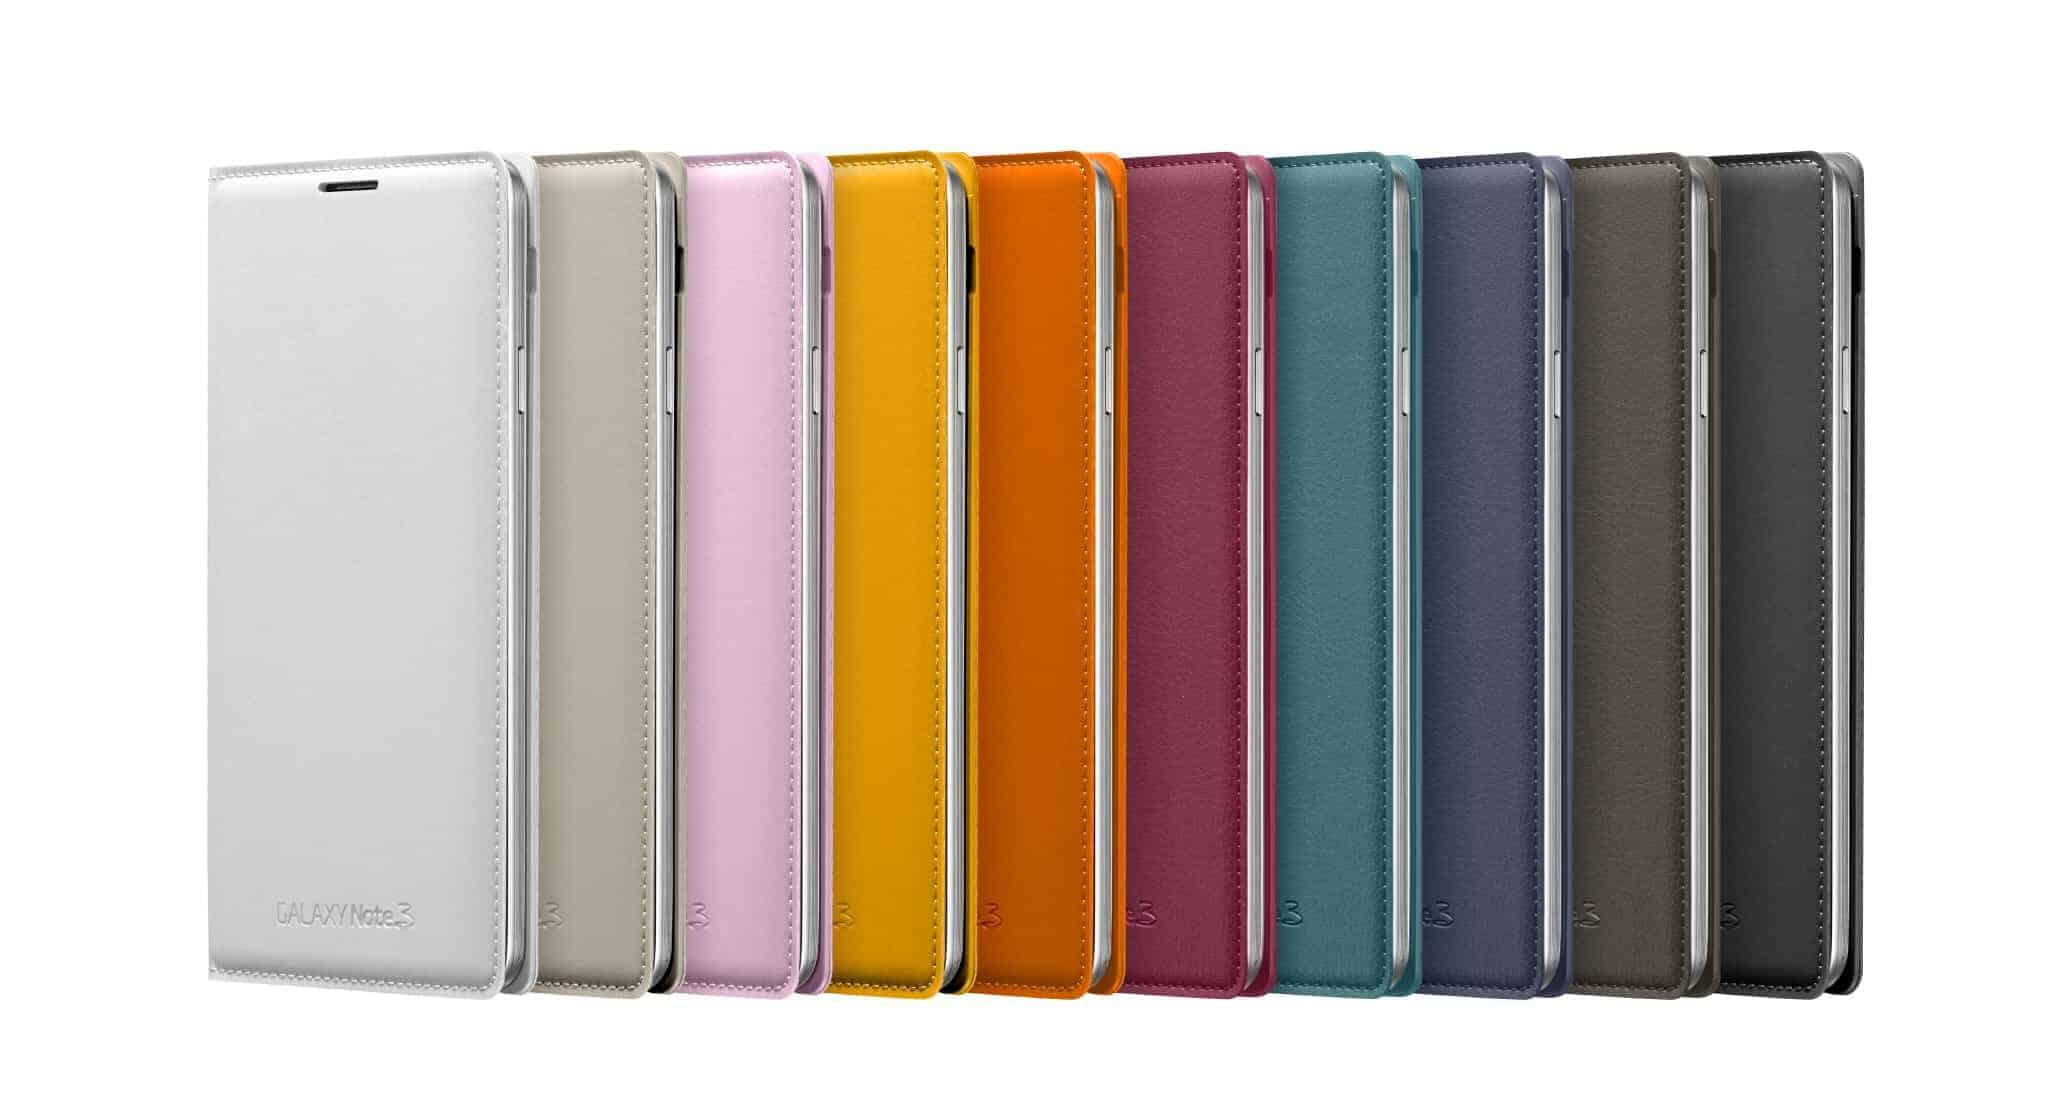 Samsung-Galaxy-Note-3-Accessories-Flip-Cover